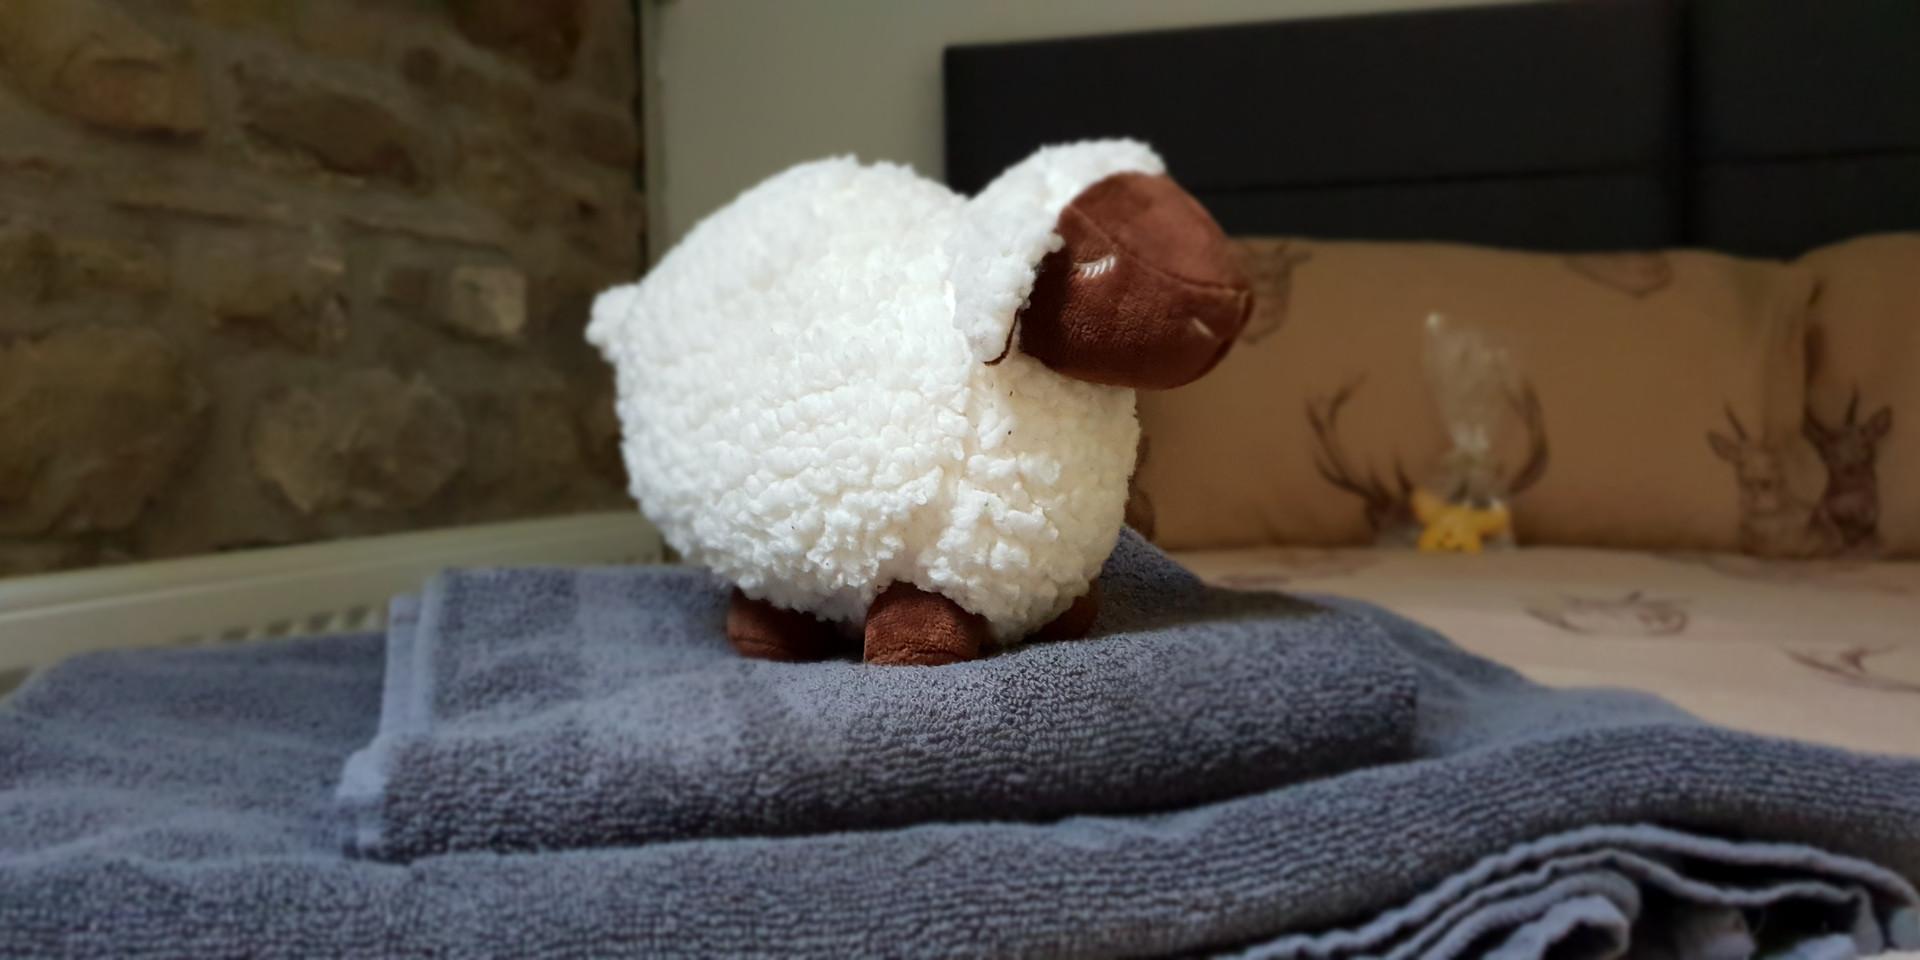 Mr Sheepy